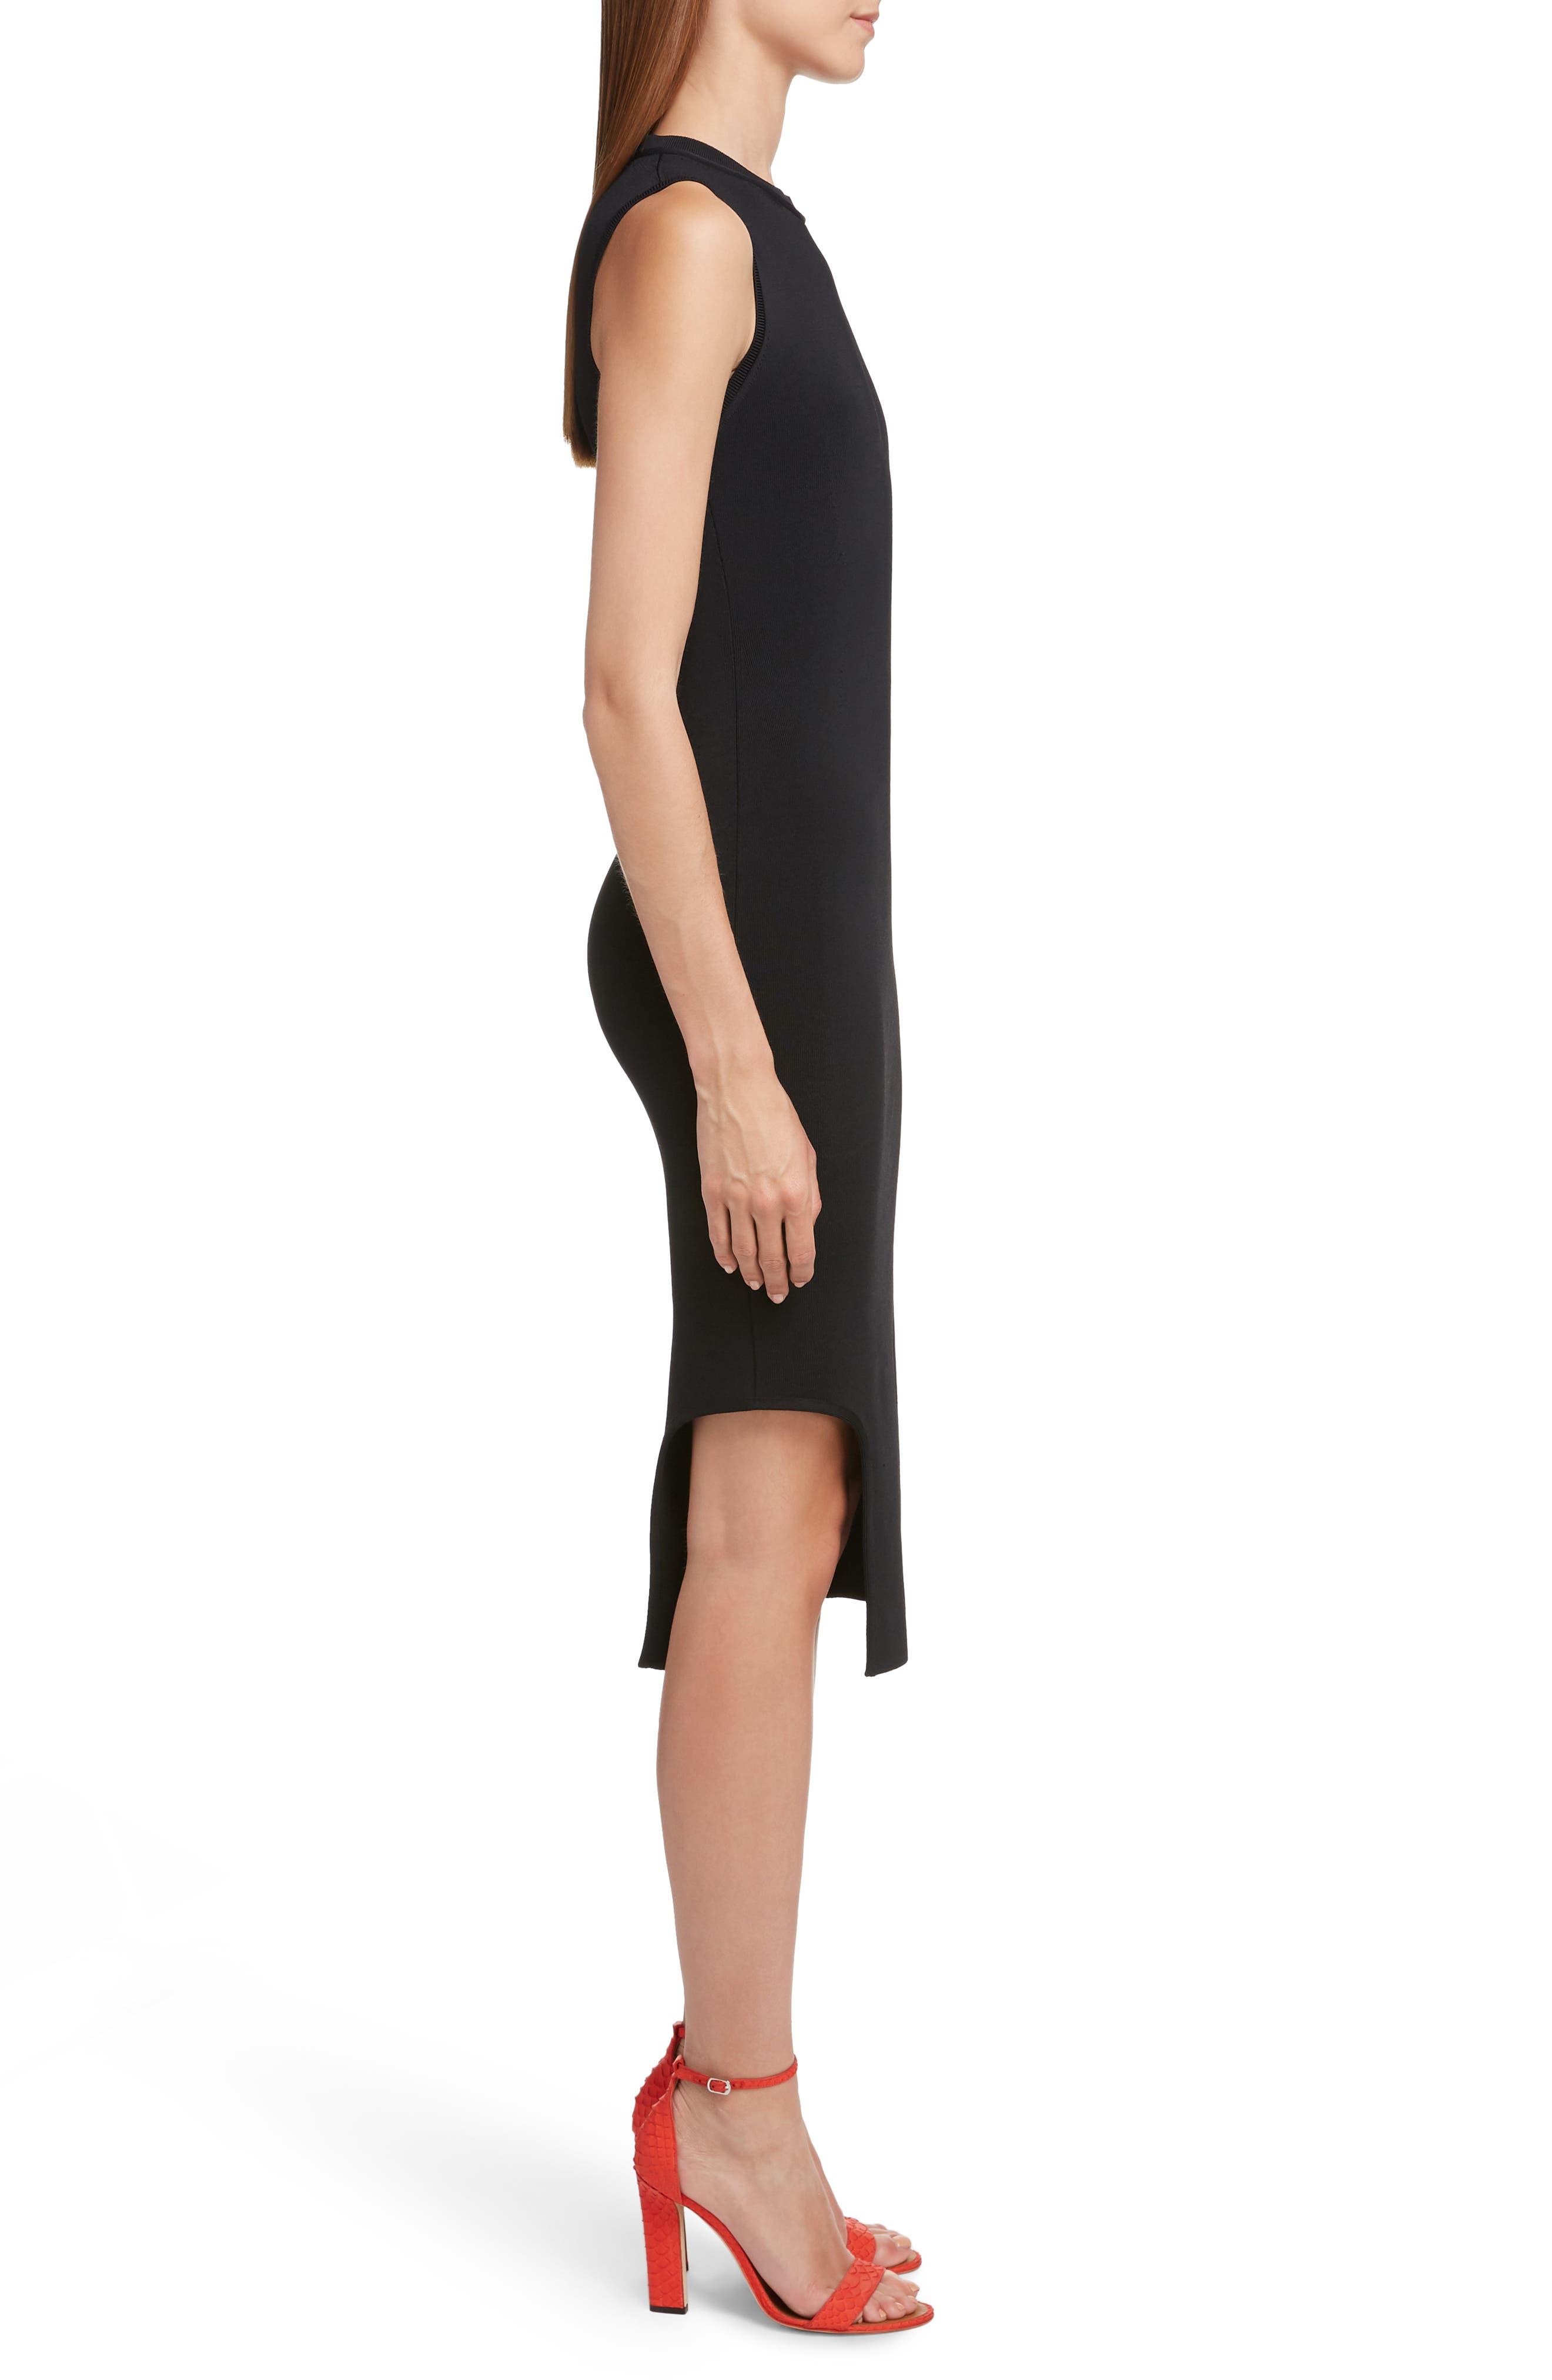 VICTORIA BECKHAM, Cutout Knit Dress, Alternate thumbnail 3, color, BLACK